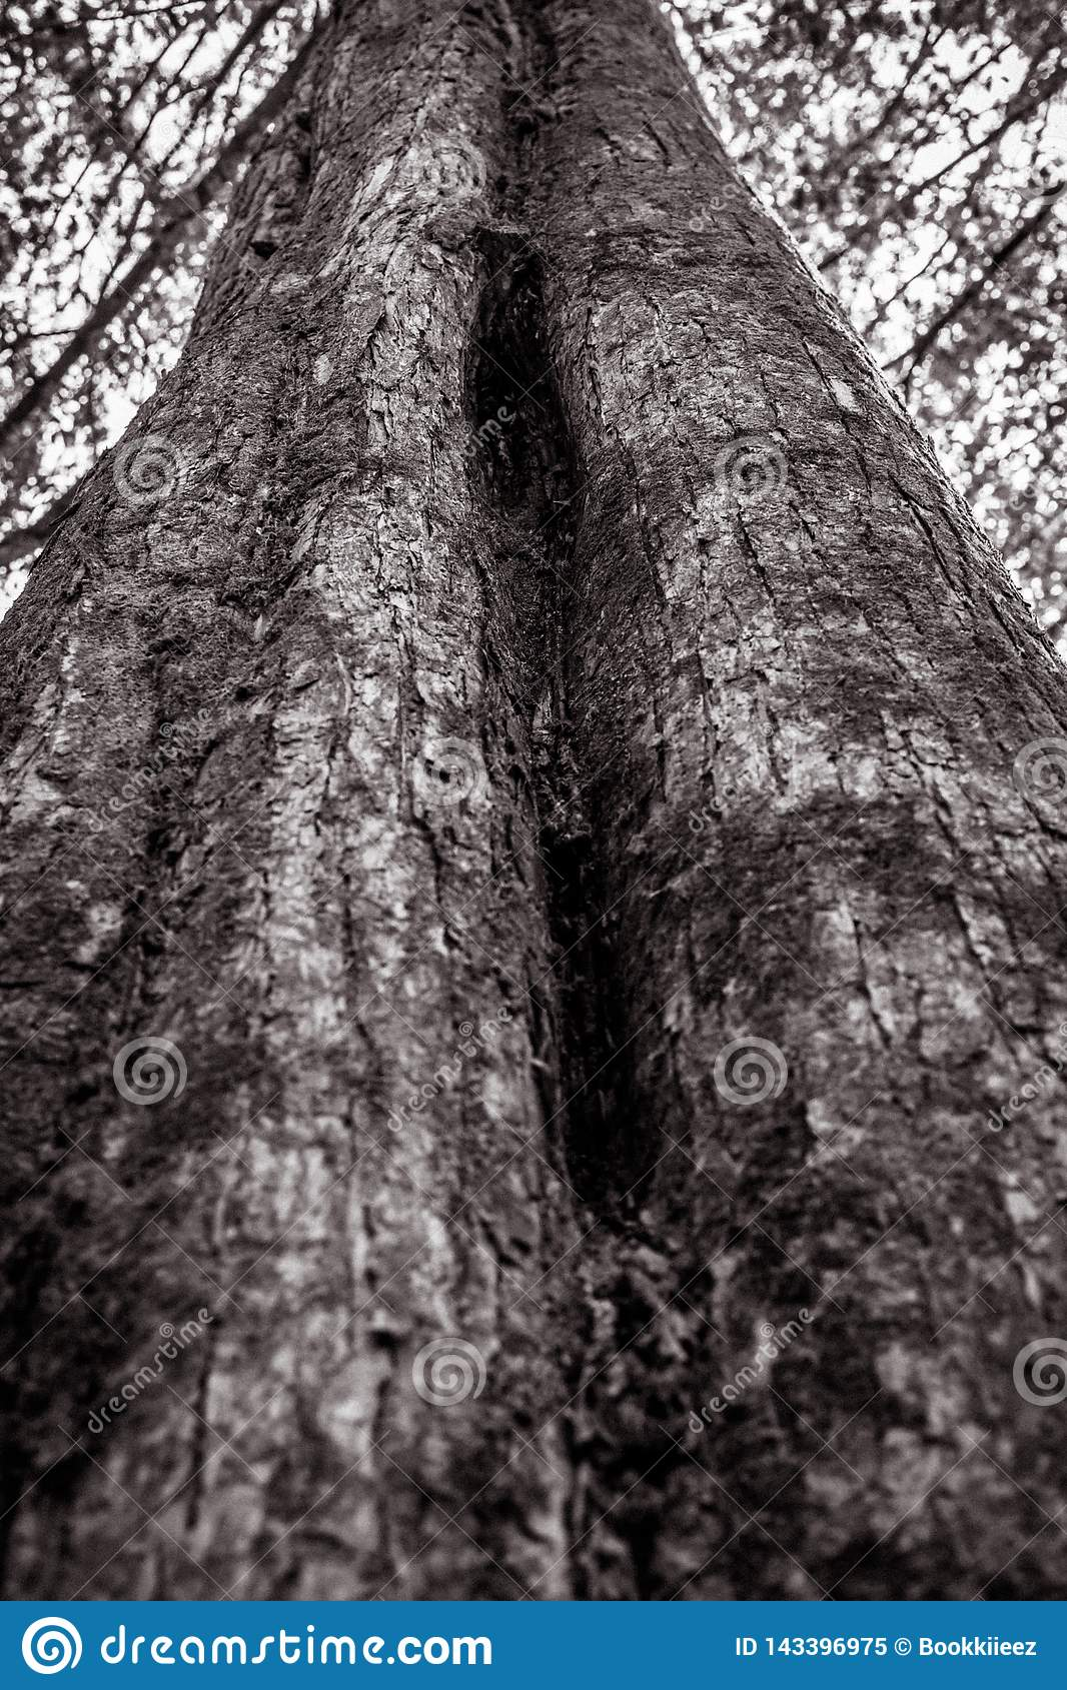 Beschaffenheit des großen Baums im Schwarzweiss-Ton